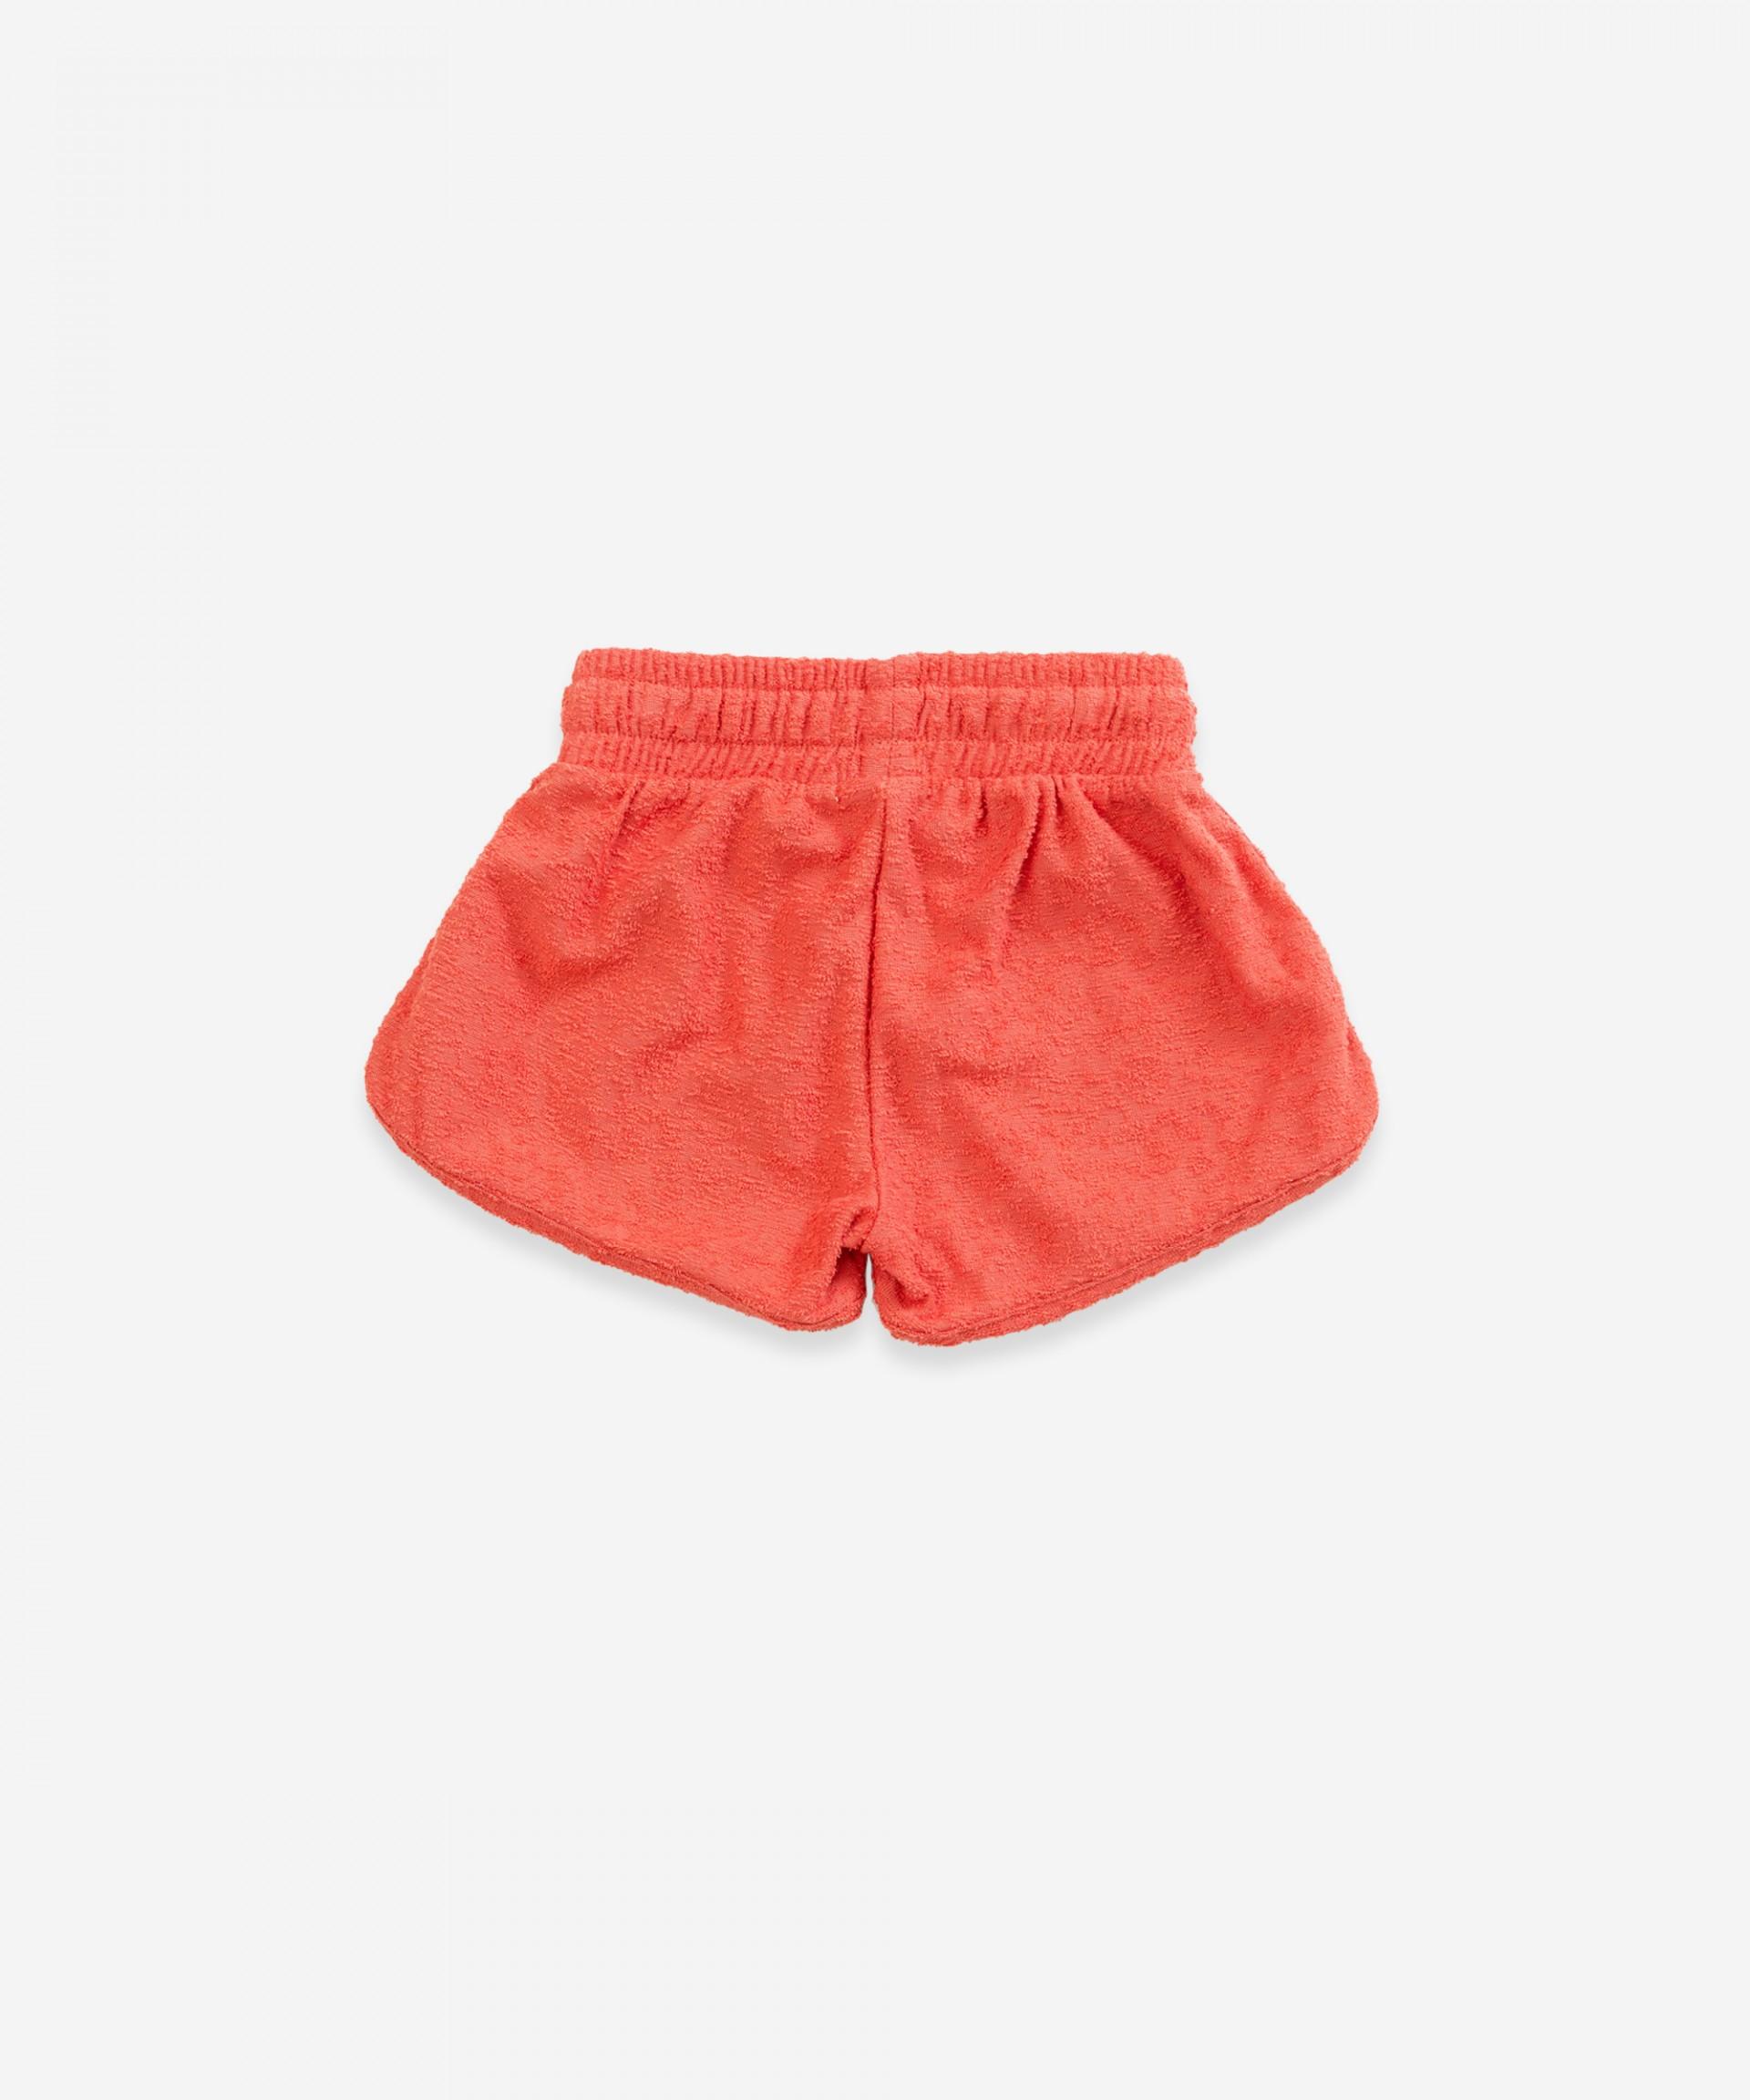 Textured cotton shorts | Weaving